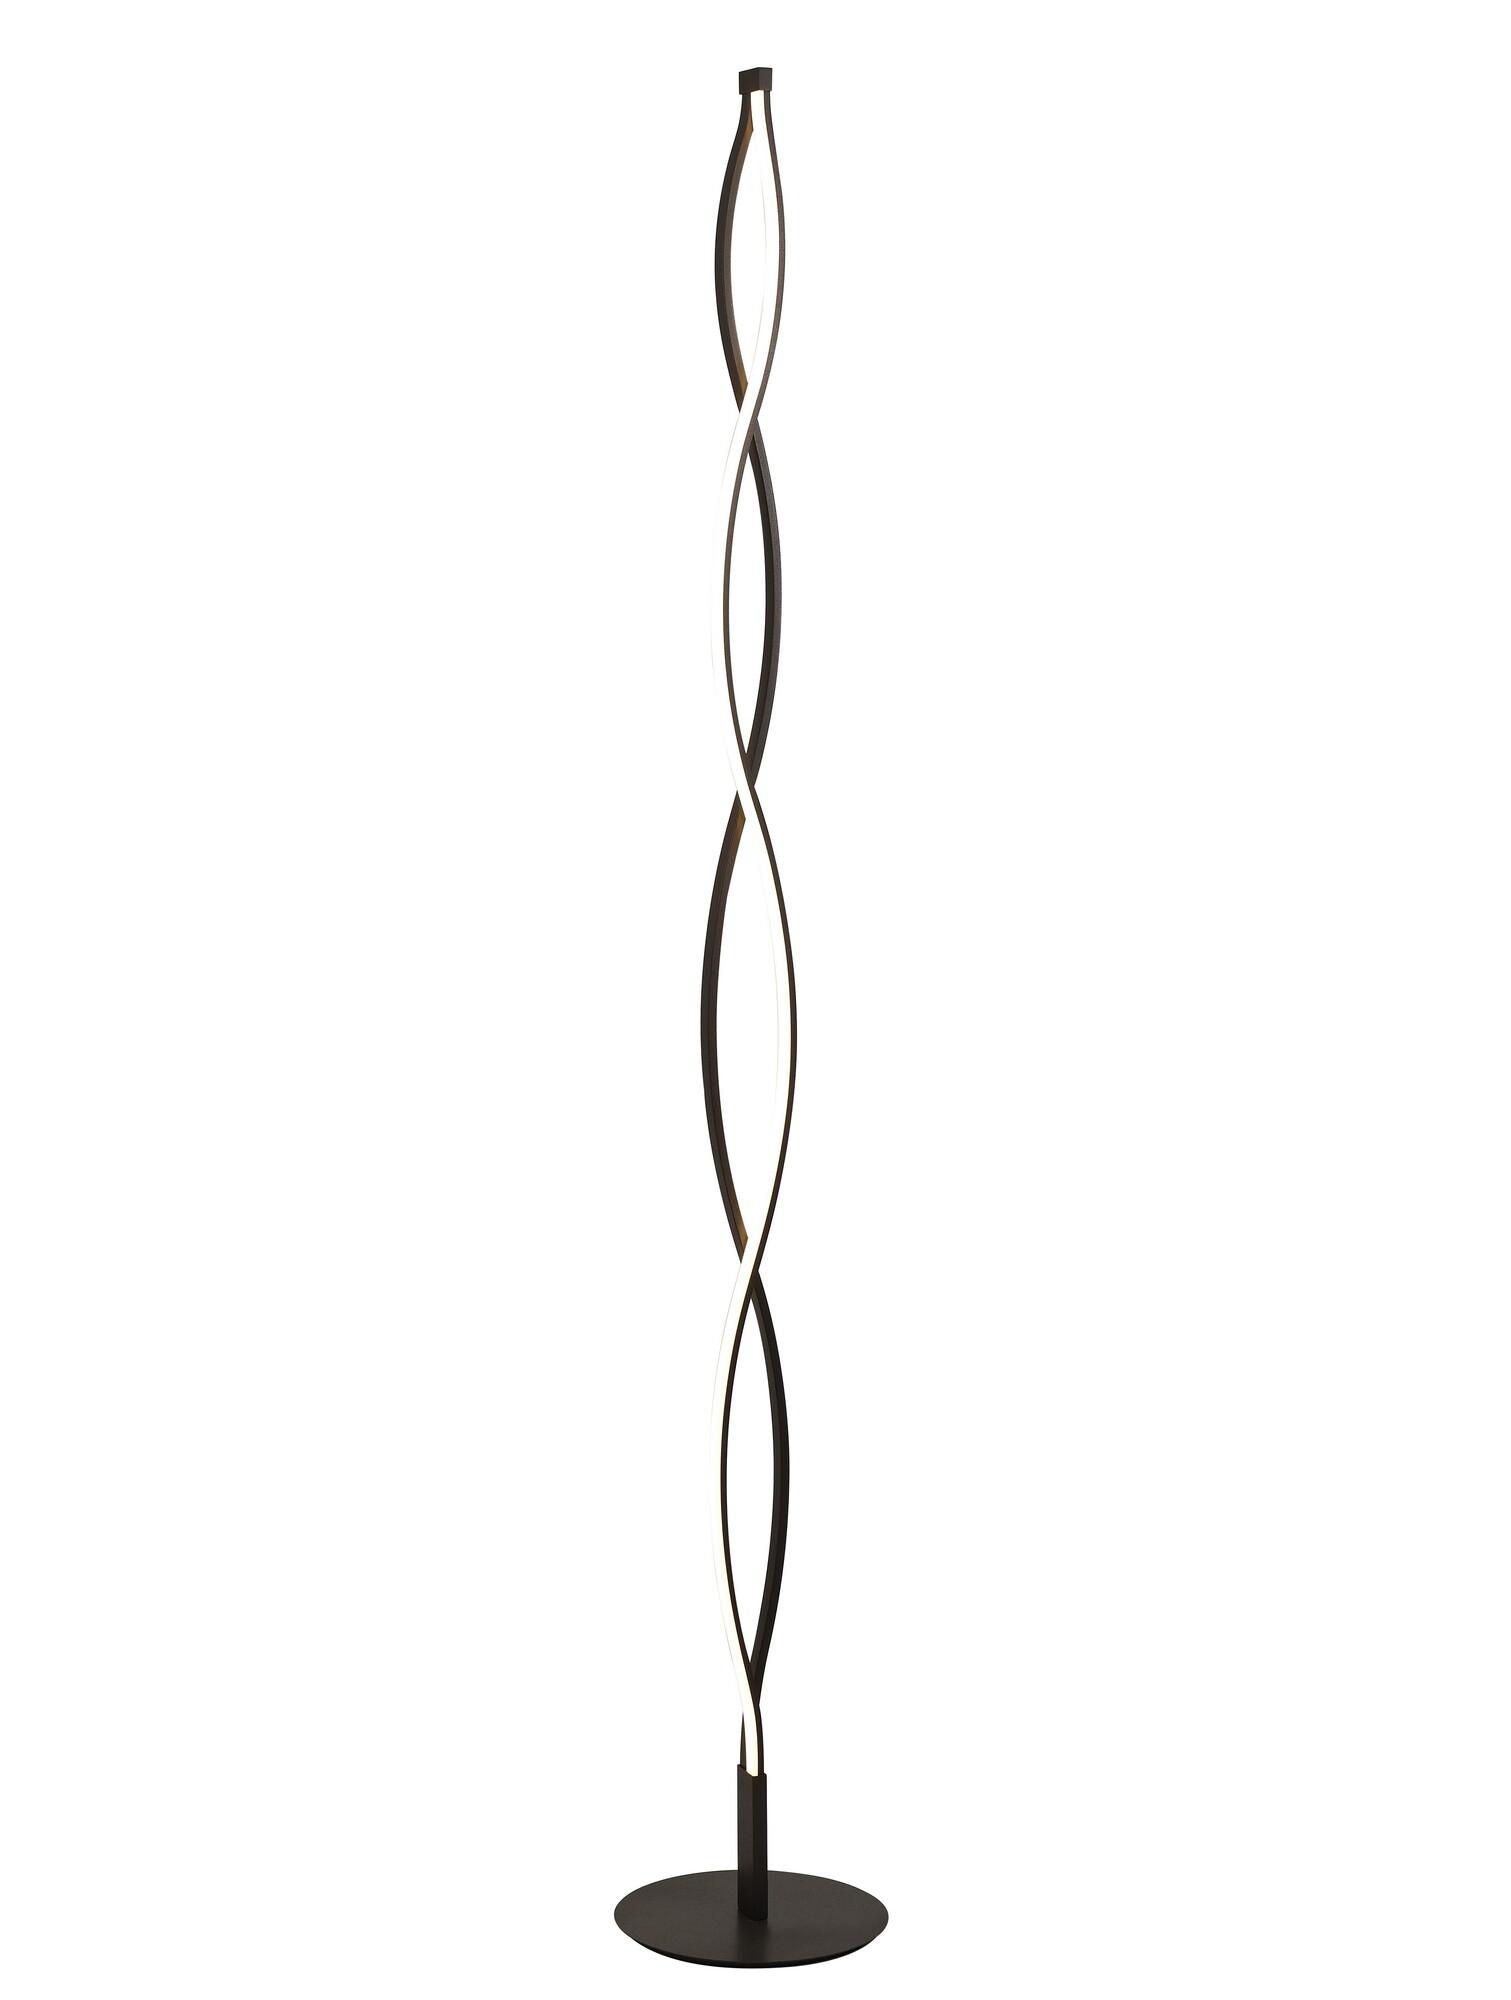 SAHARA Vloerlamp LED 1x28W/2200lm Bruin